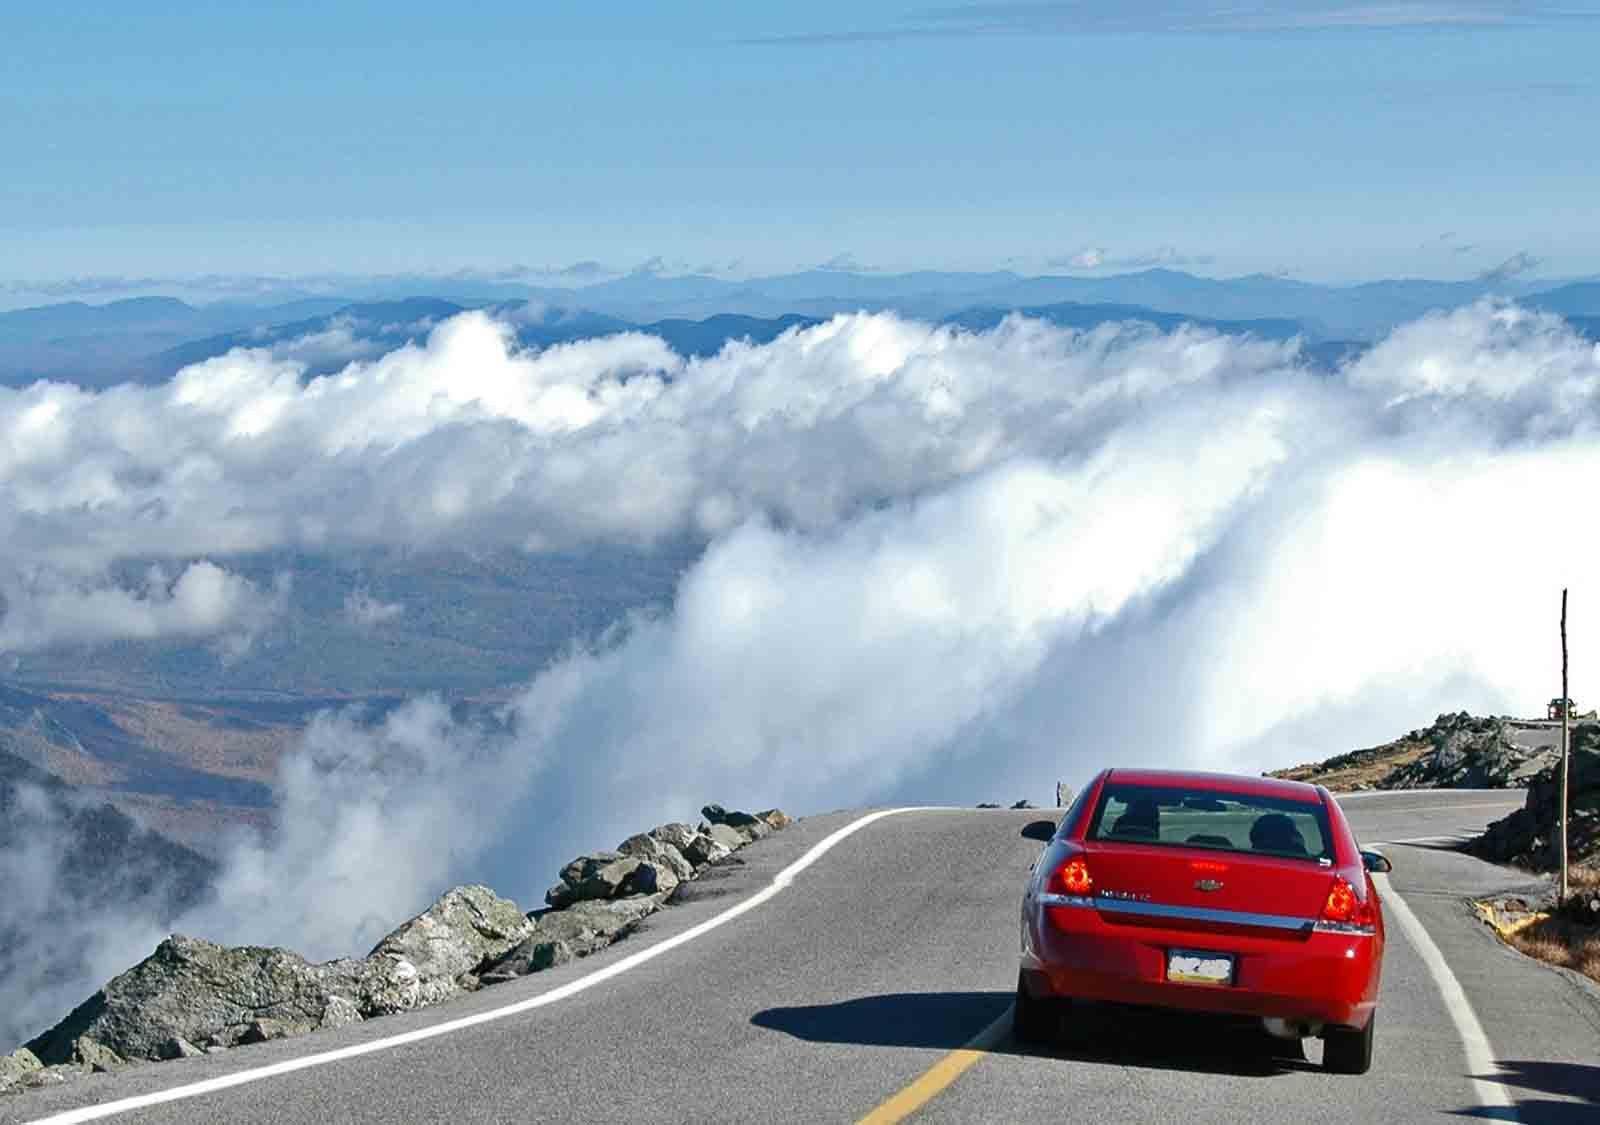 Mount Washington Auto Road, New Hampshire